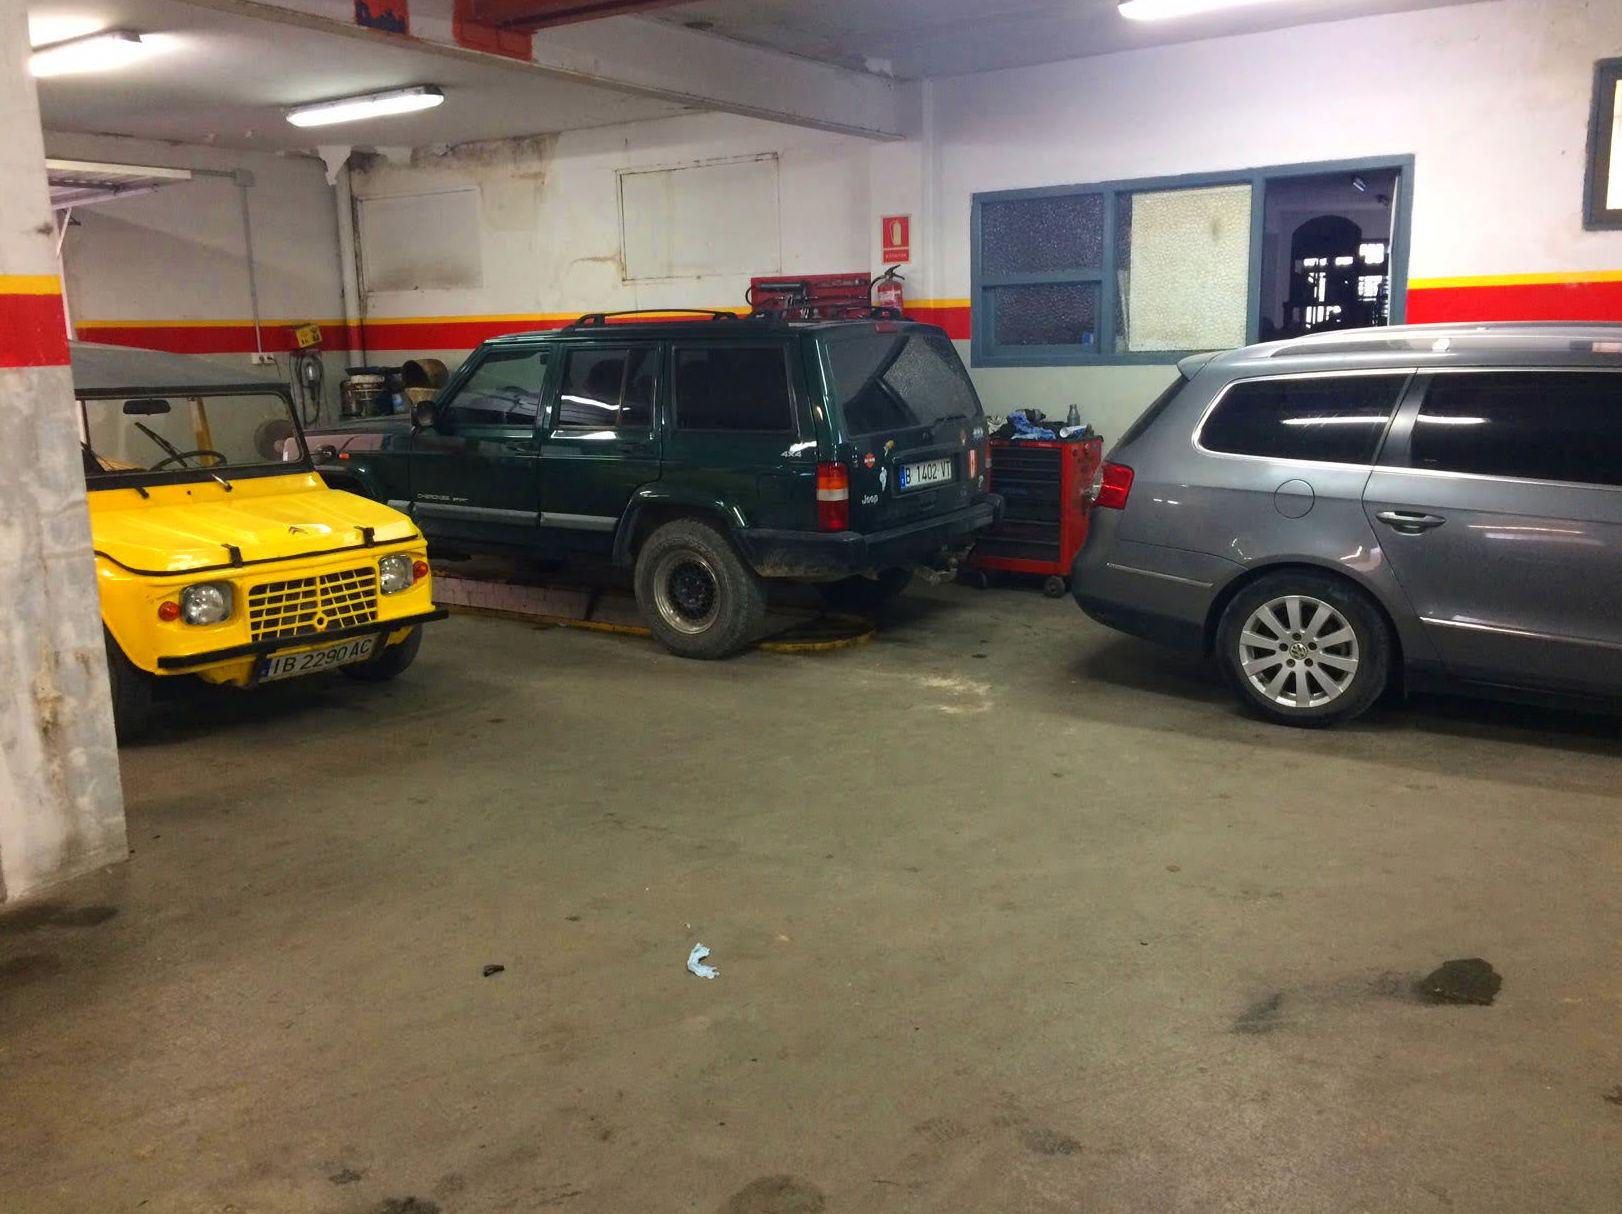 Foto 2 de Talleres de automóviles en Formentera | Taller San Fernando Motor